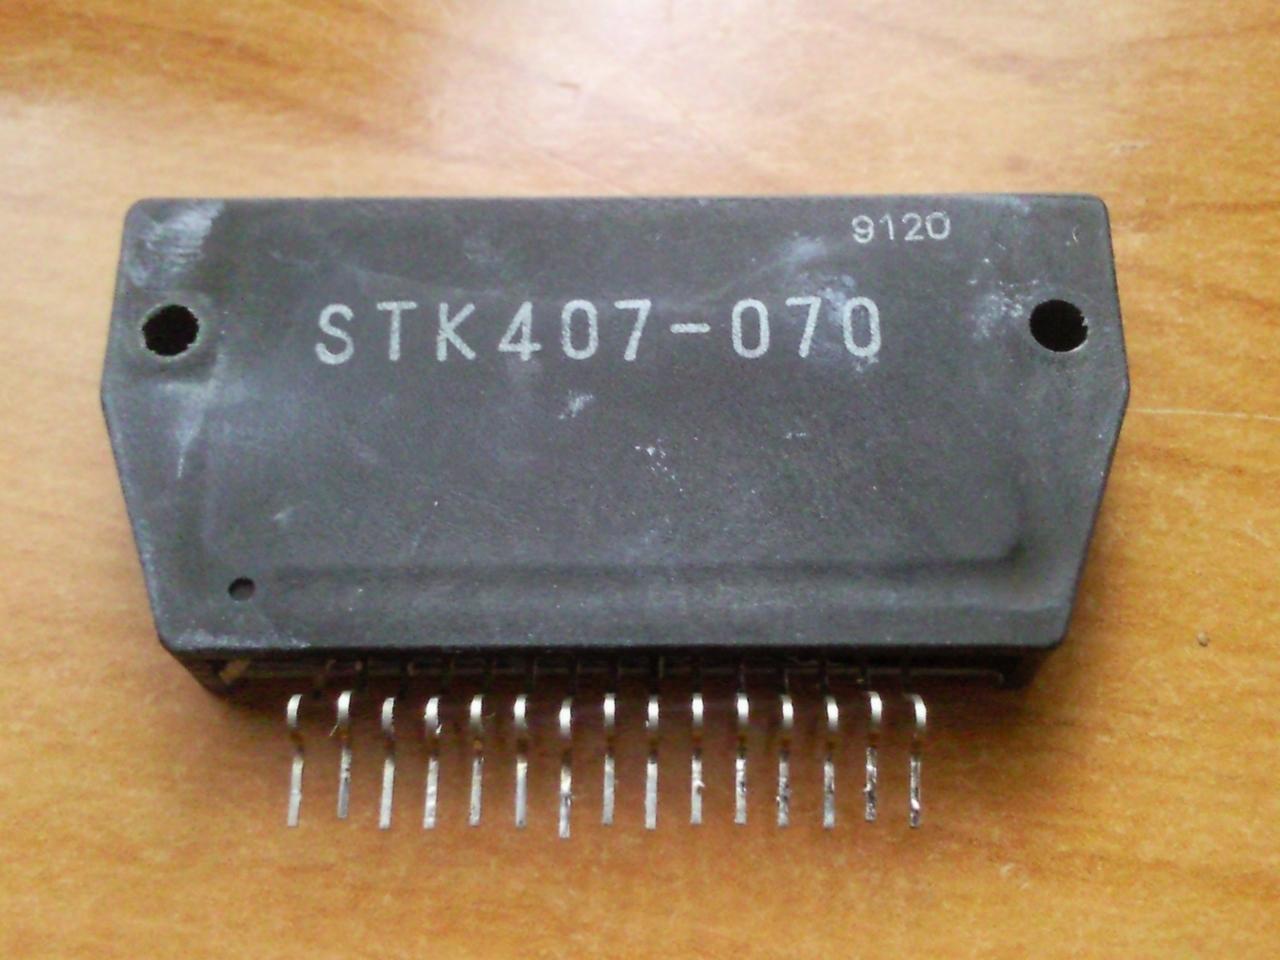 Stk407-070 datasheet